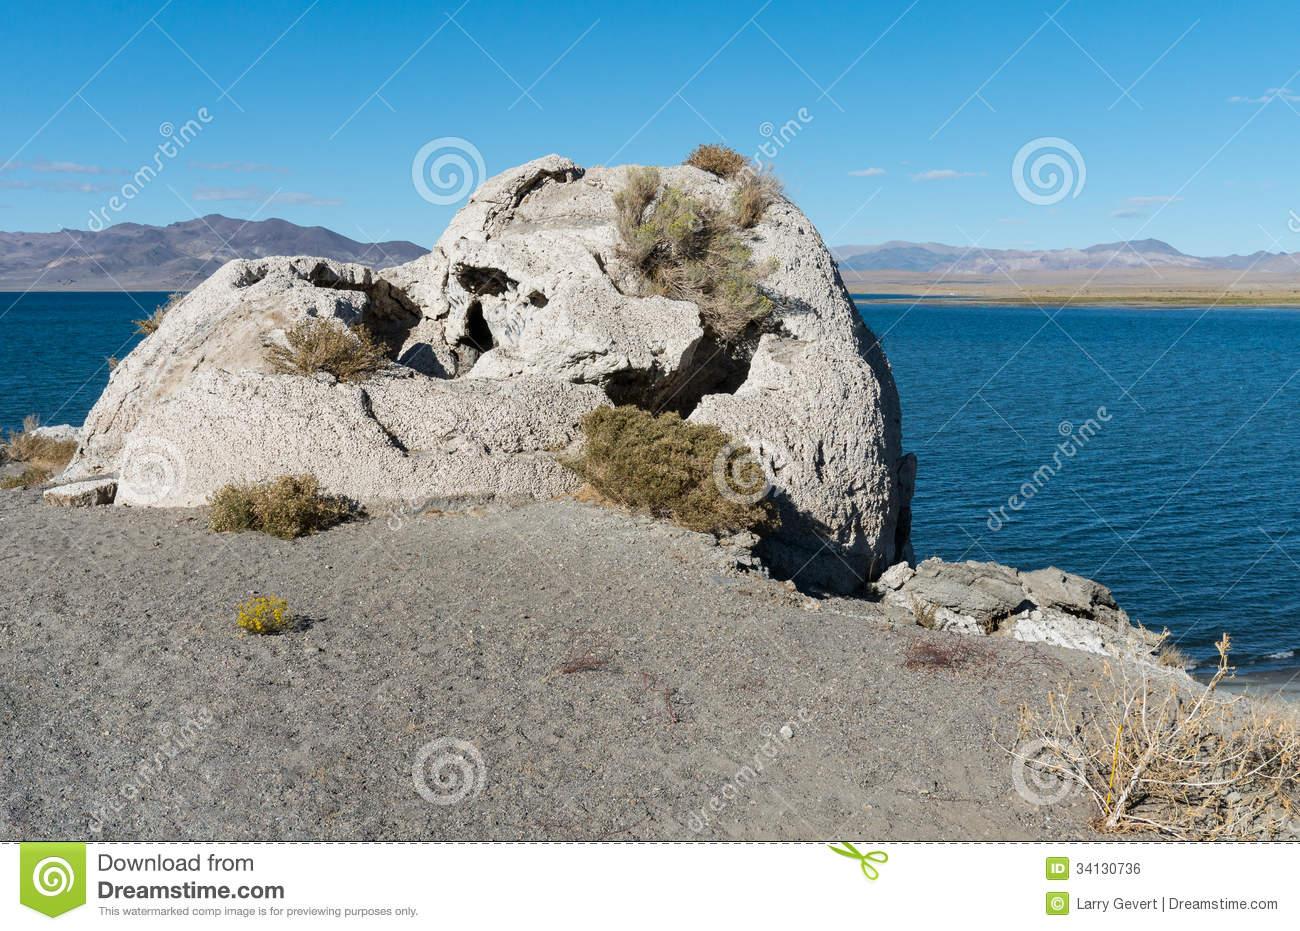 Tufa Rock At Pyramid Lake, Nevada Royalty Free Stock Photos.